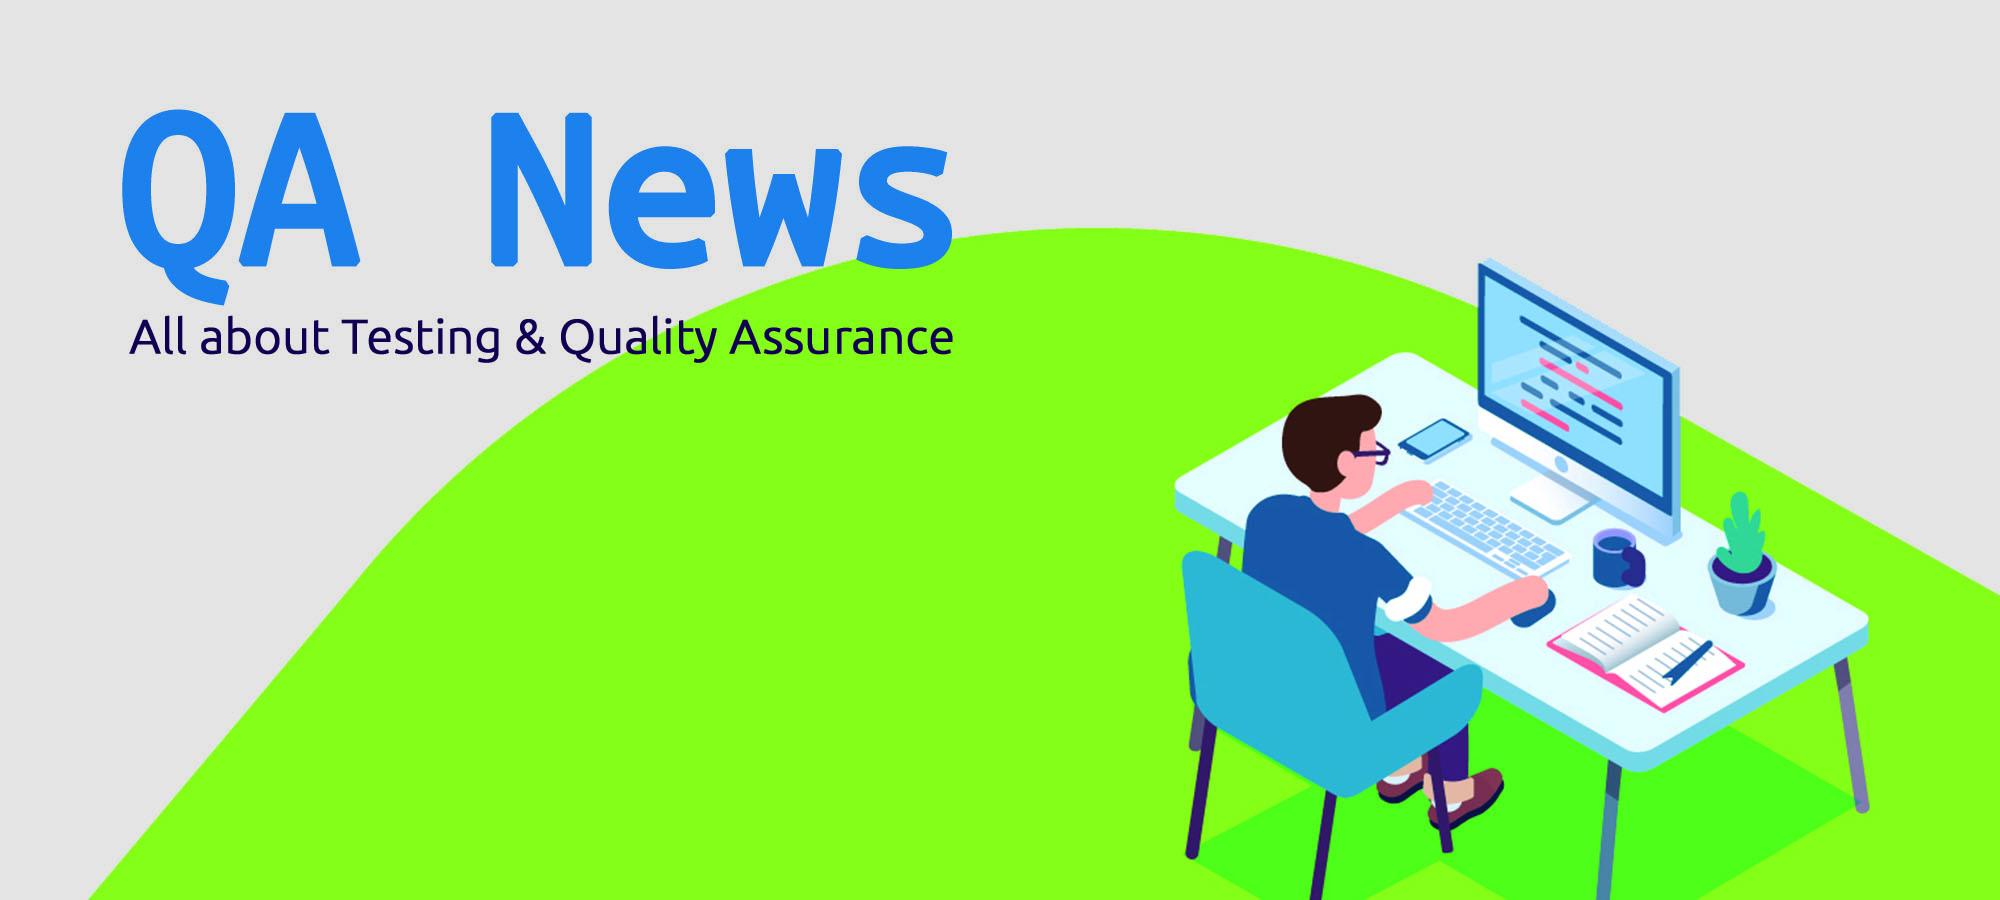 QA:news